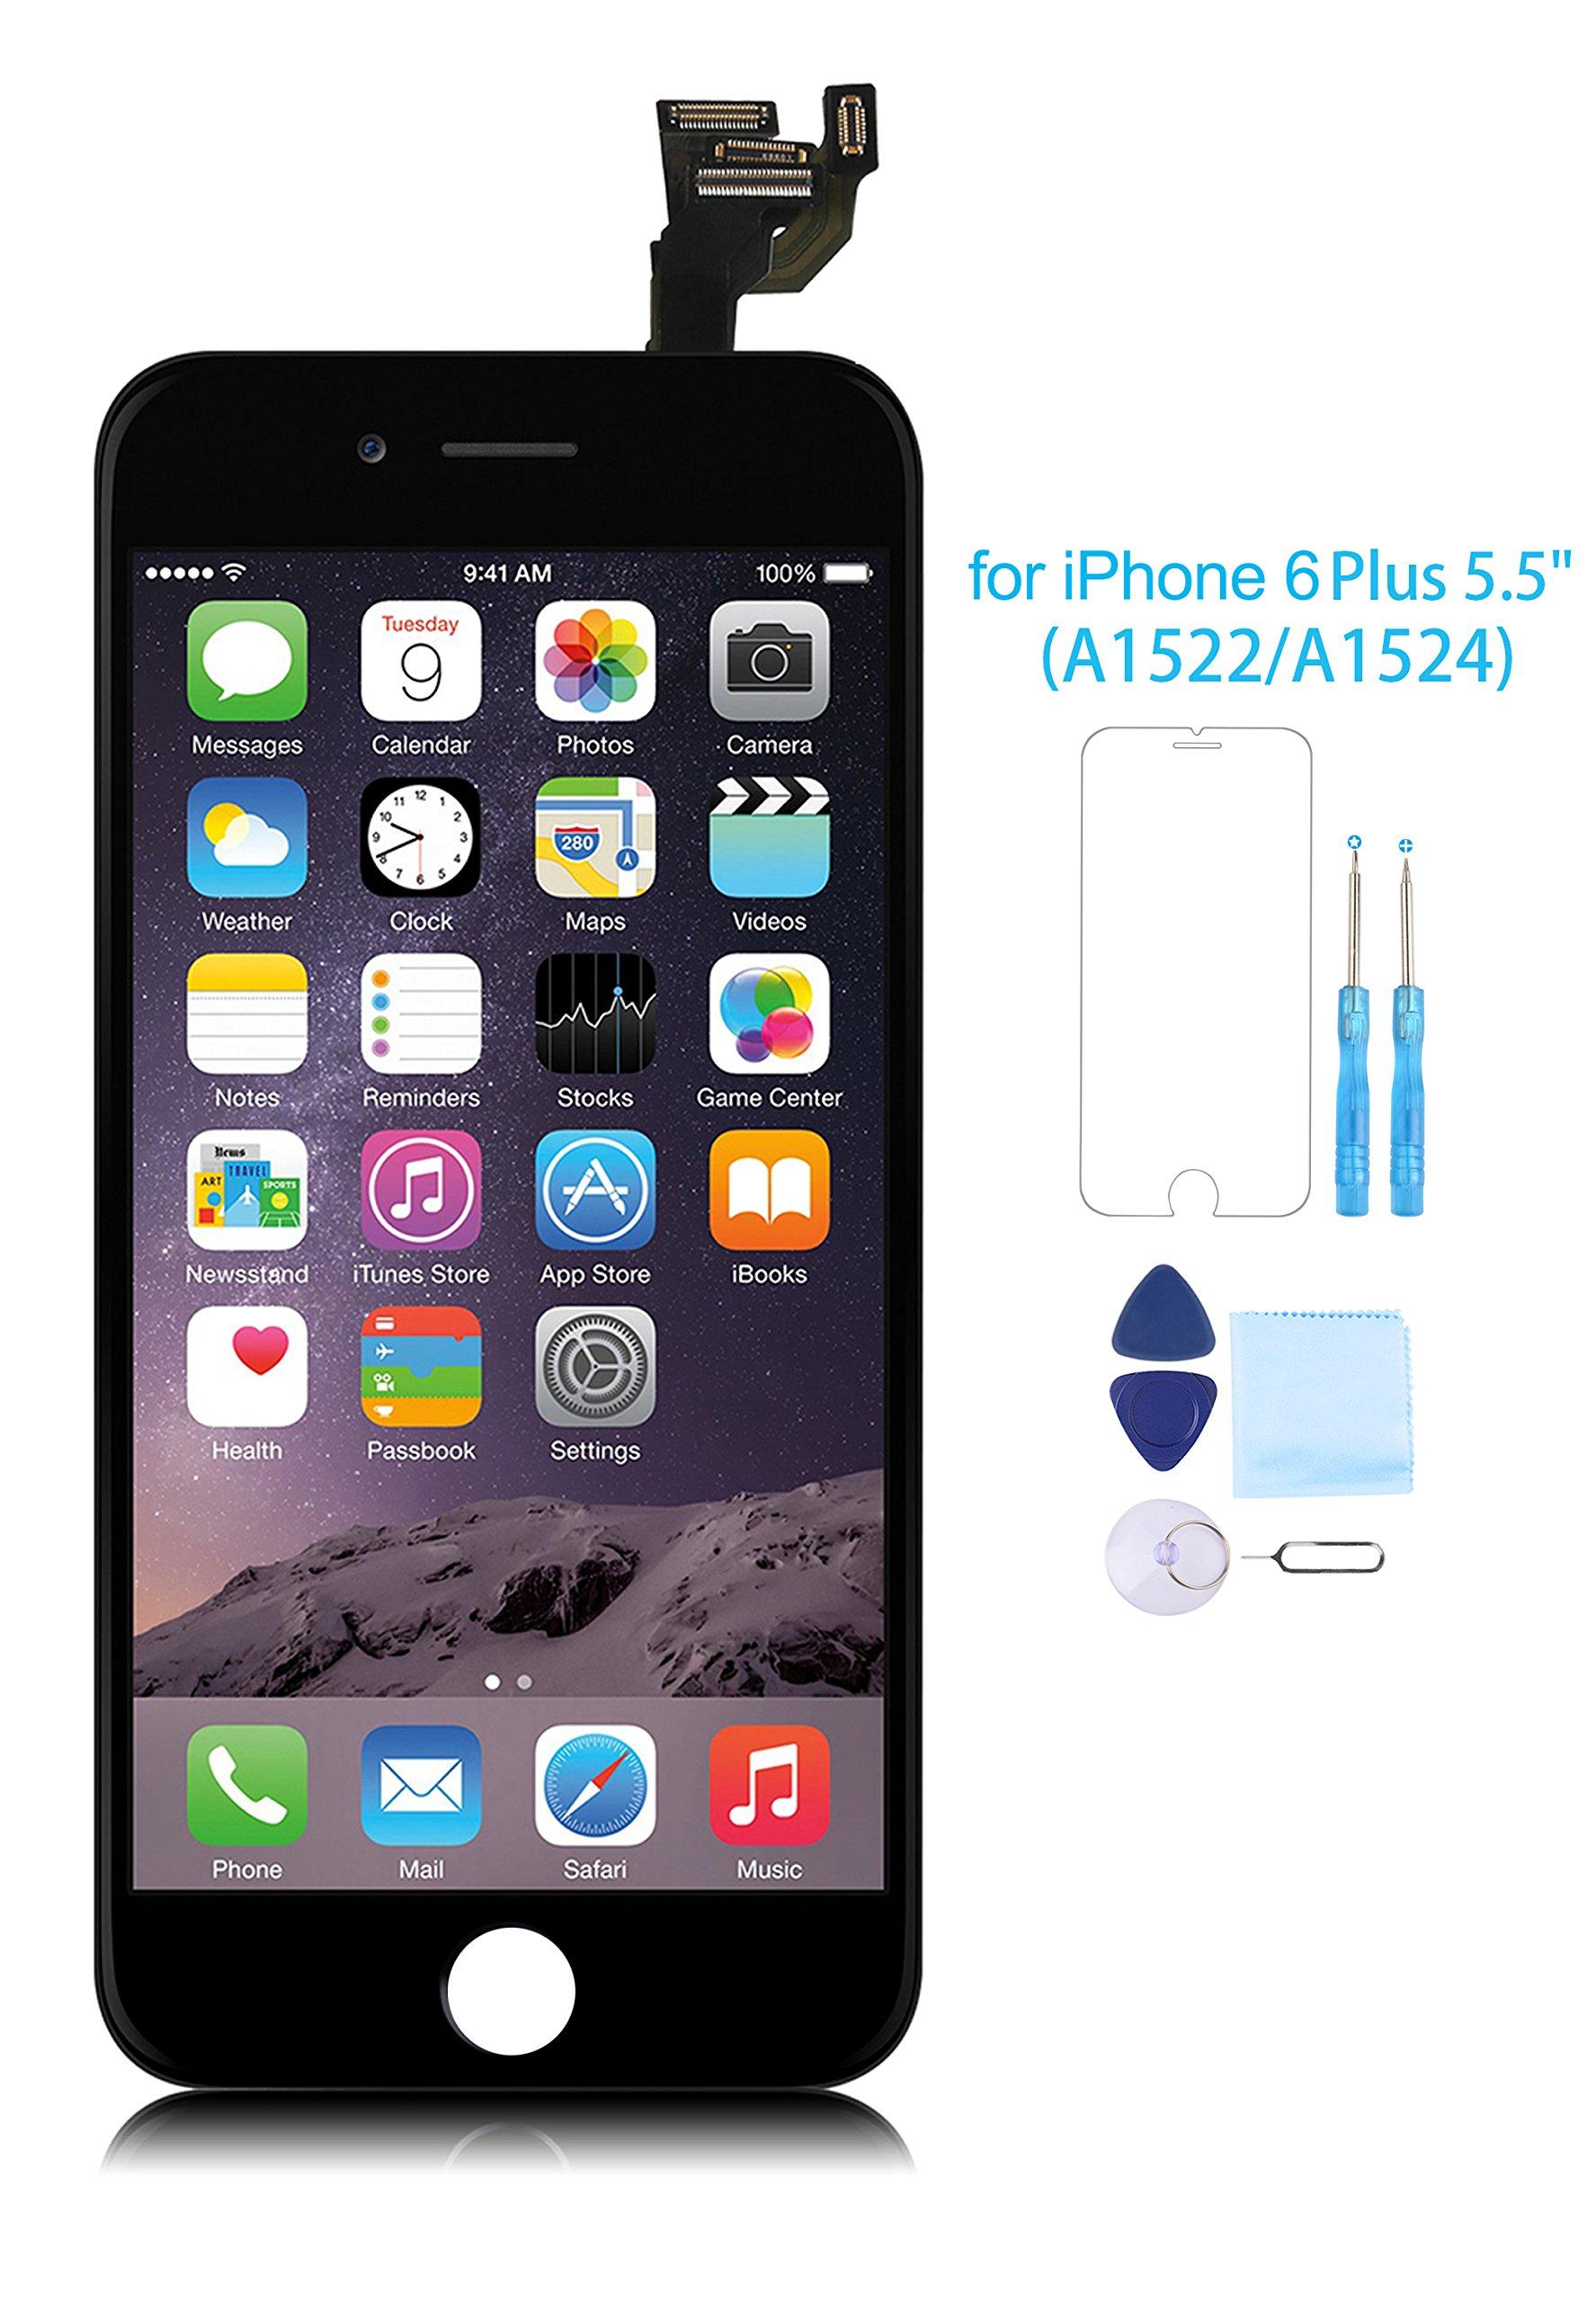 iPhone 6 Plus Screen Replacement Full Assembly LCD Touch Digitizer Display Front Camera Facing Proximity Sensor+ Ear Speaker+ Repair Tools Screen Protector Black